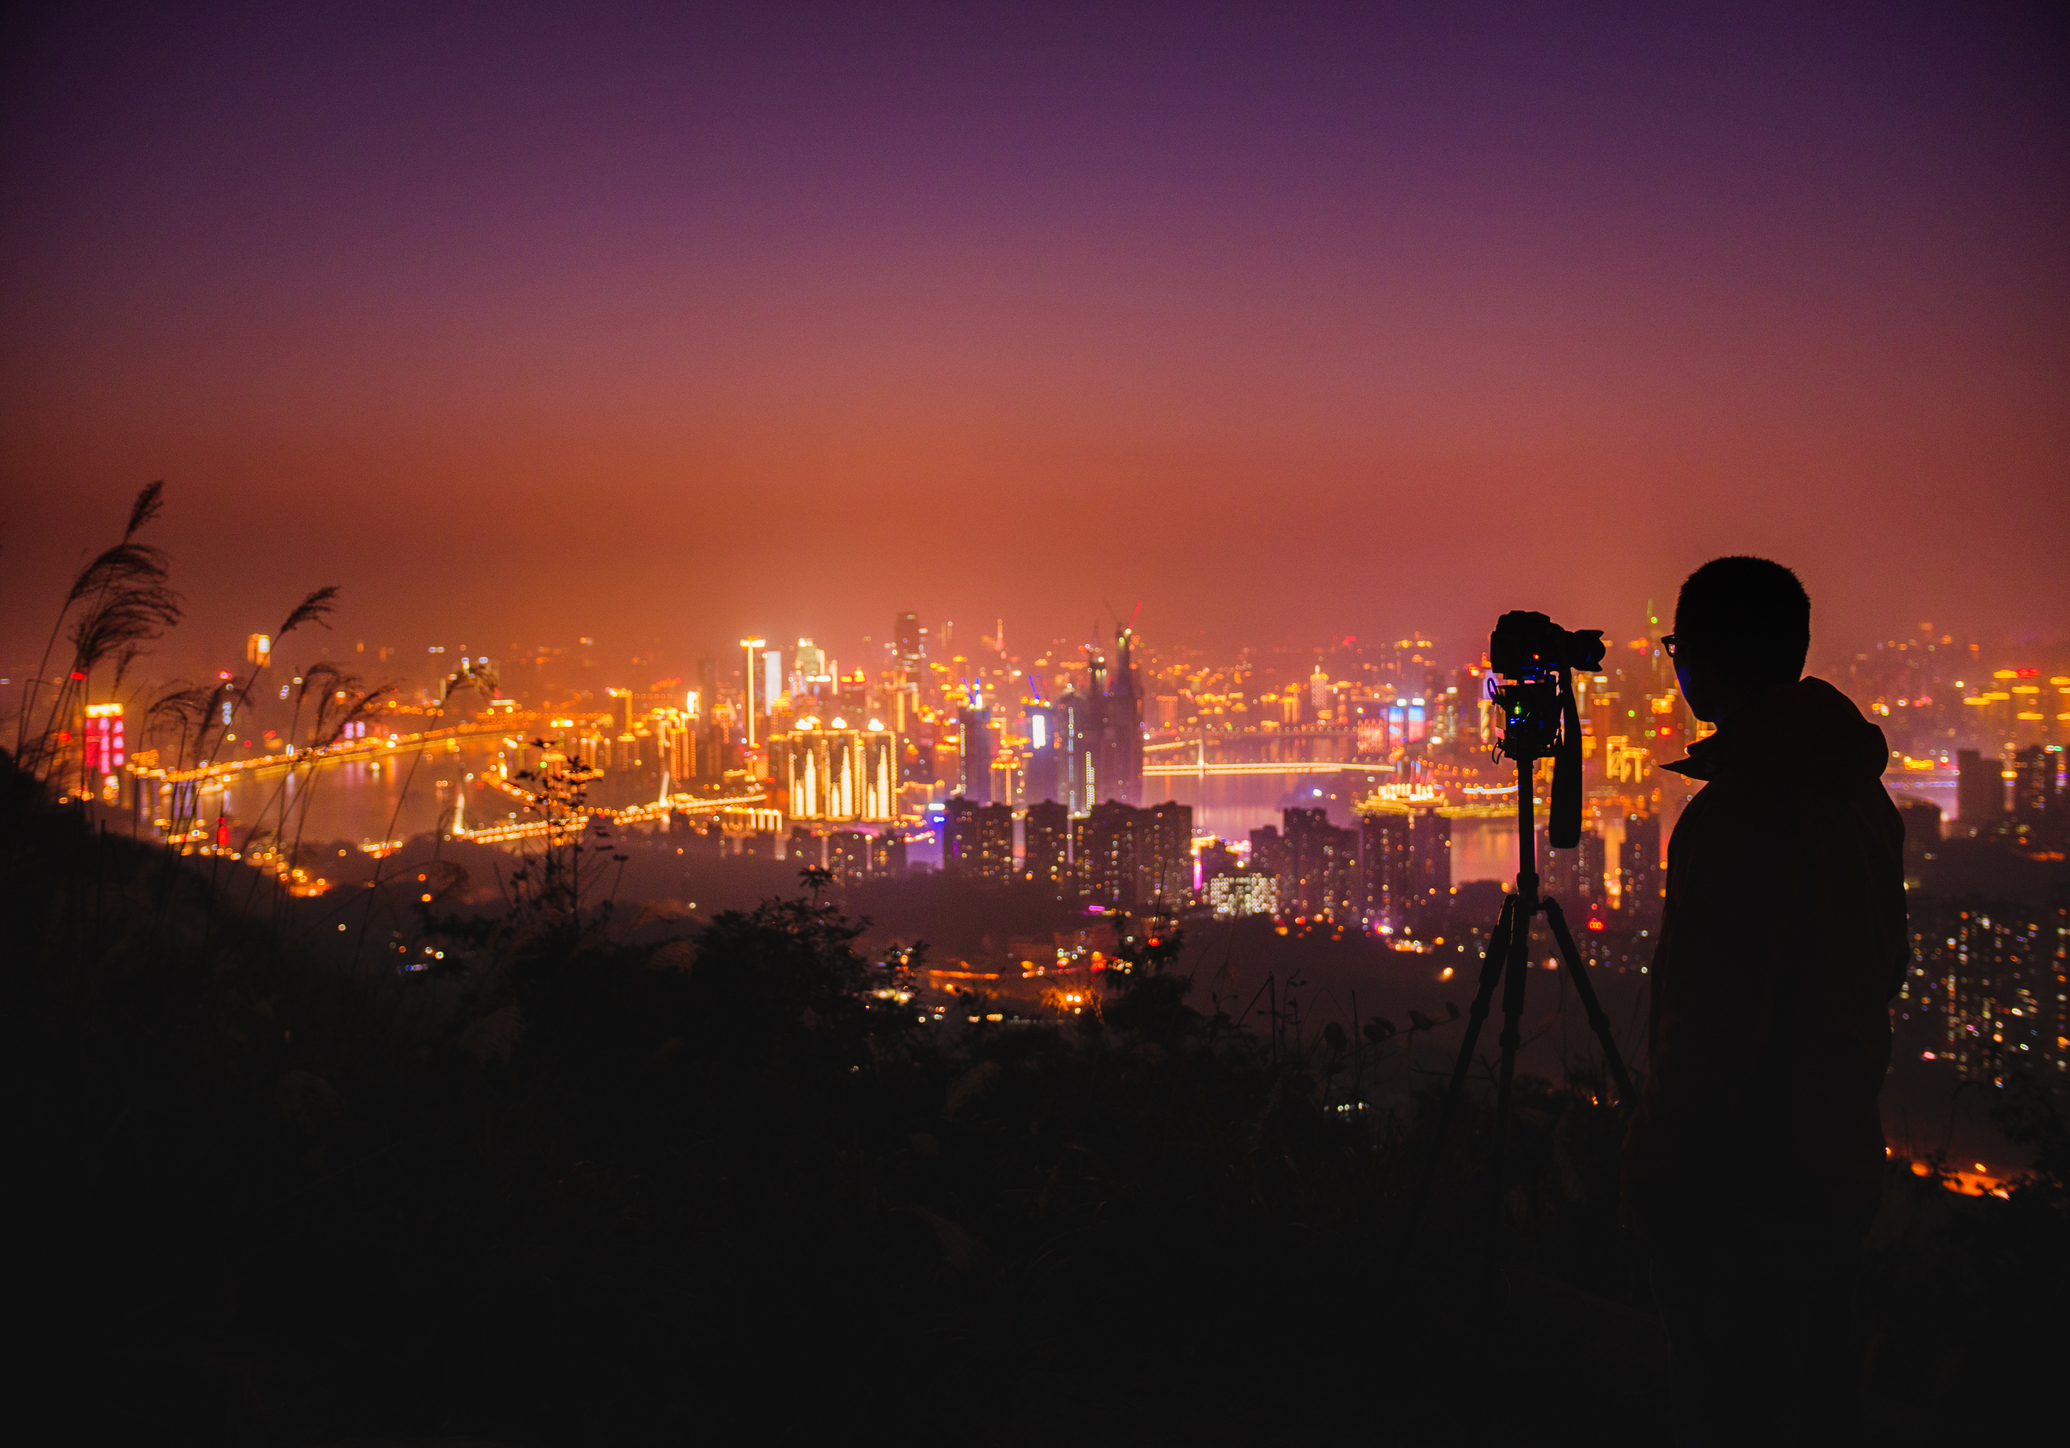 Basic Night Photography Tutorial